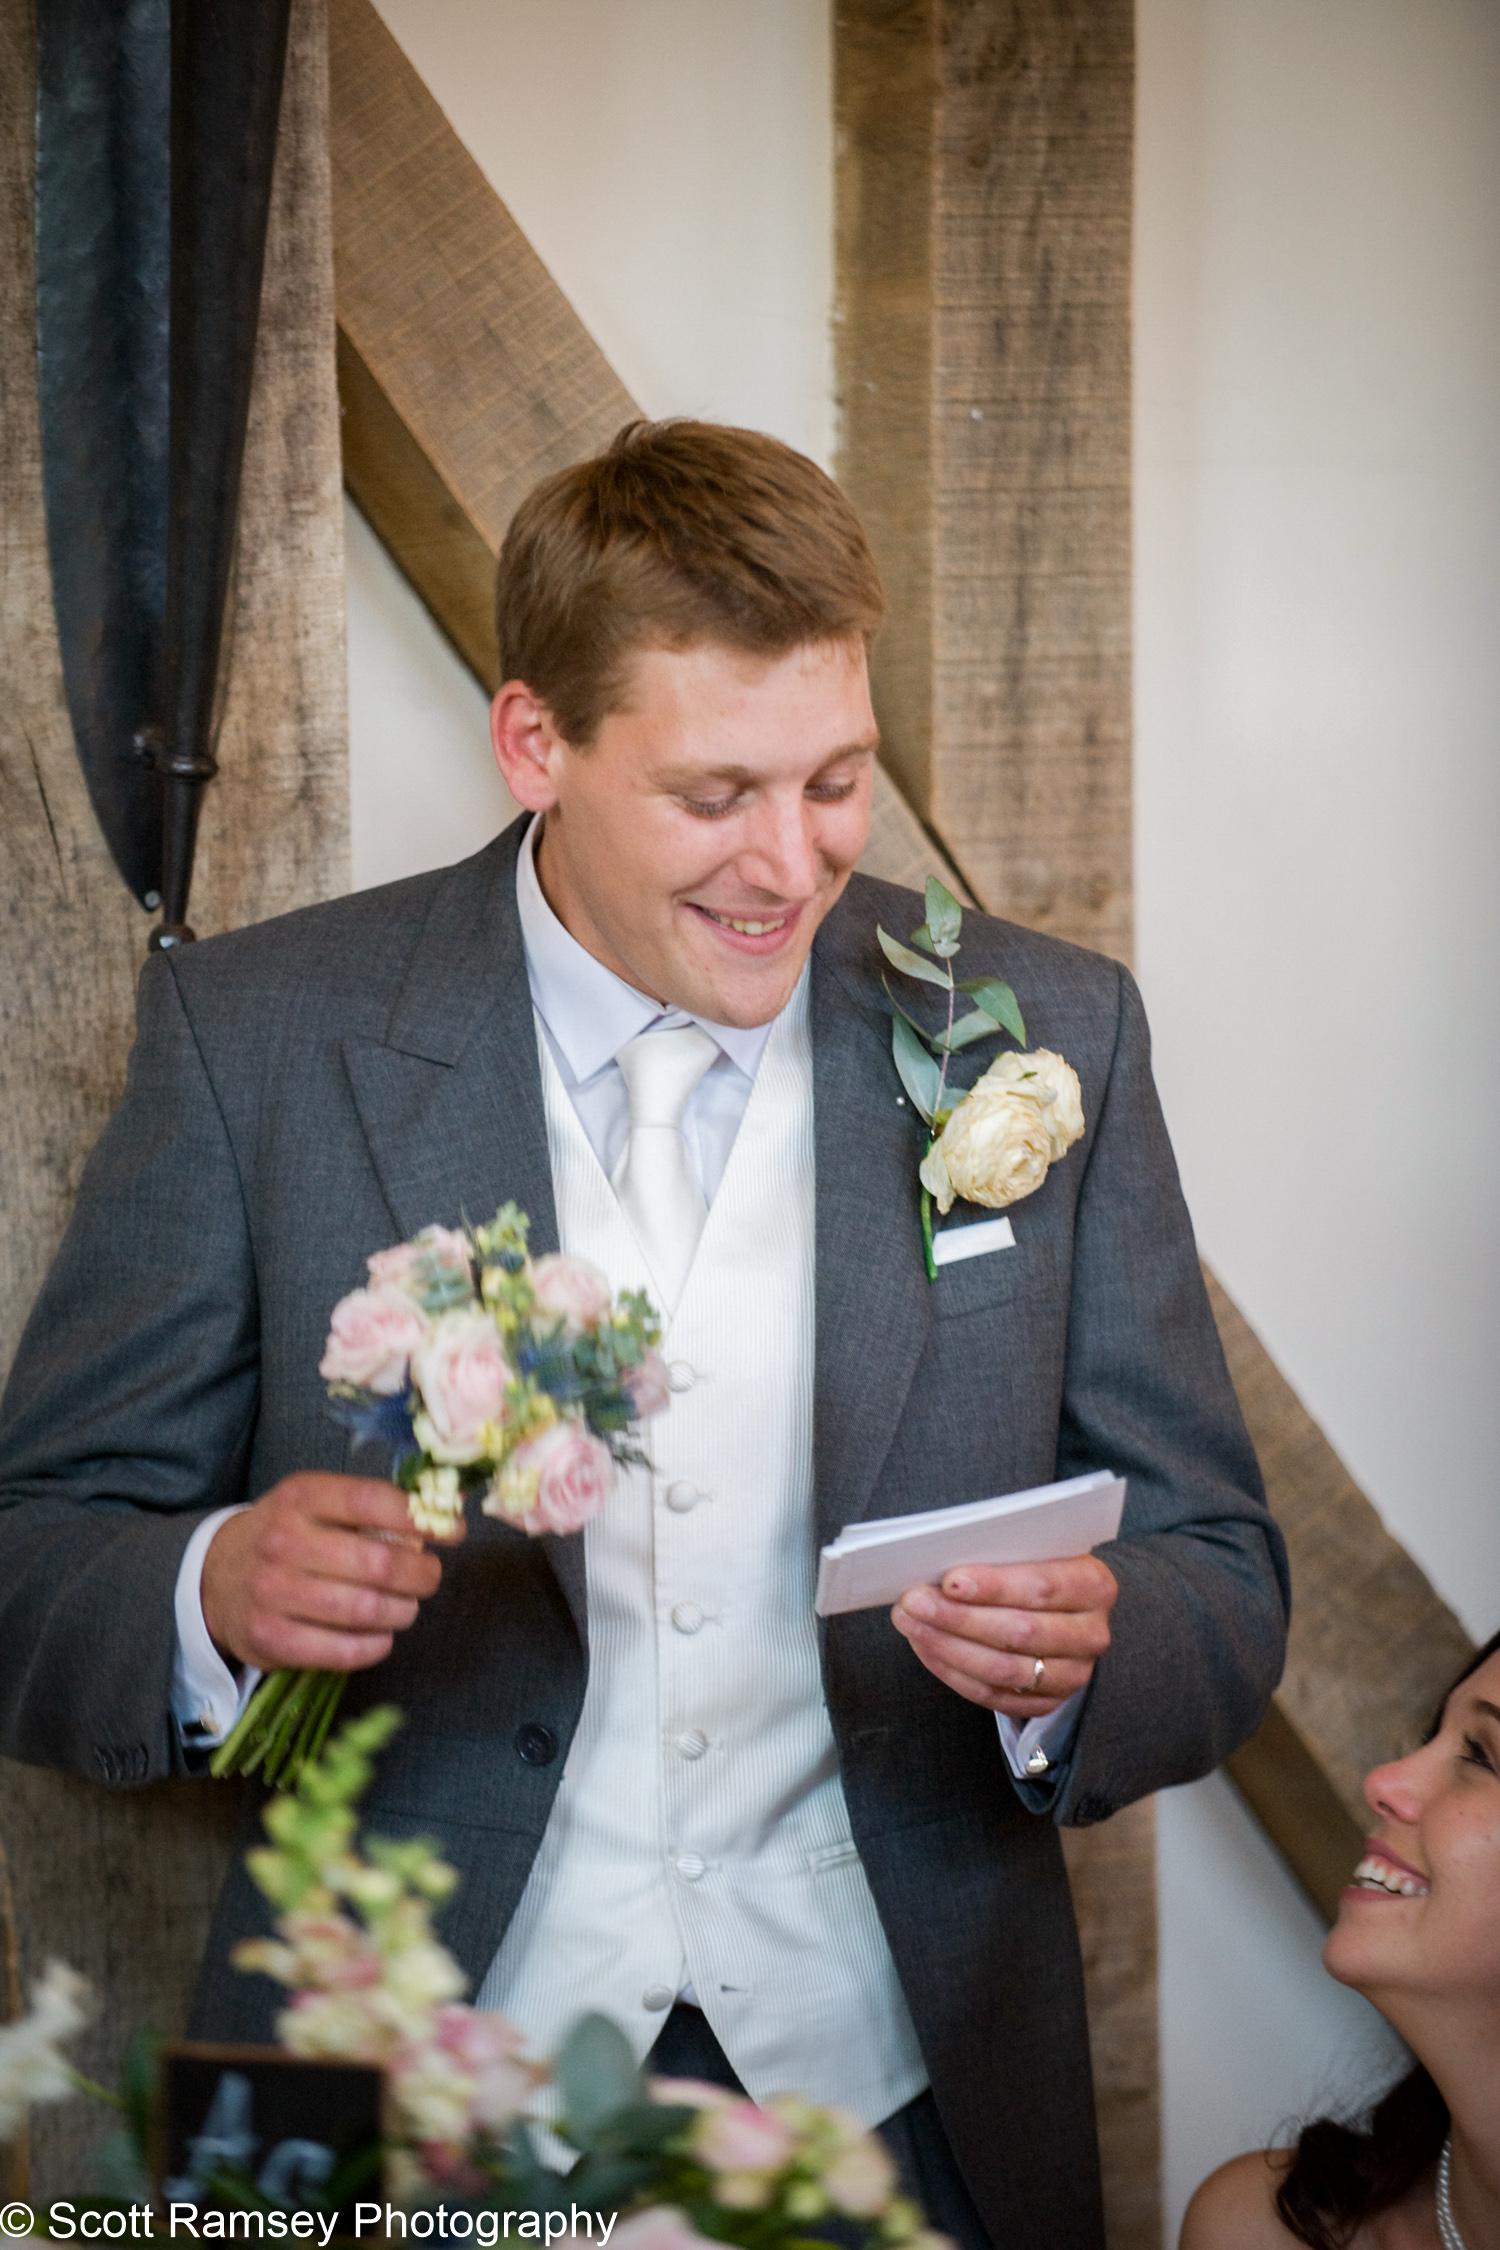 Groom Holds Wedding Flowers Gate Street Barn